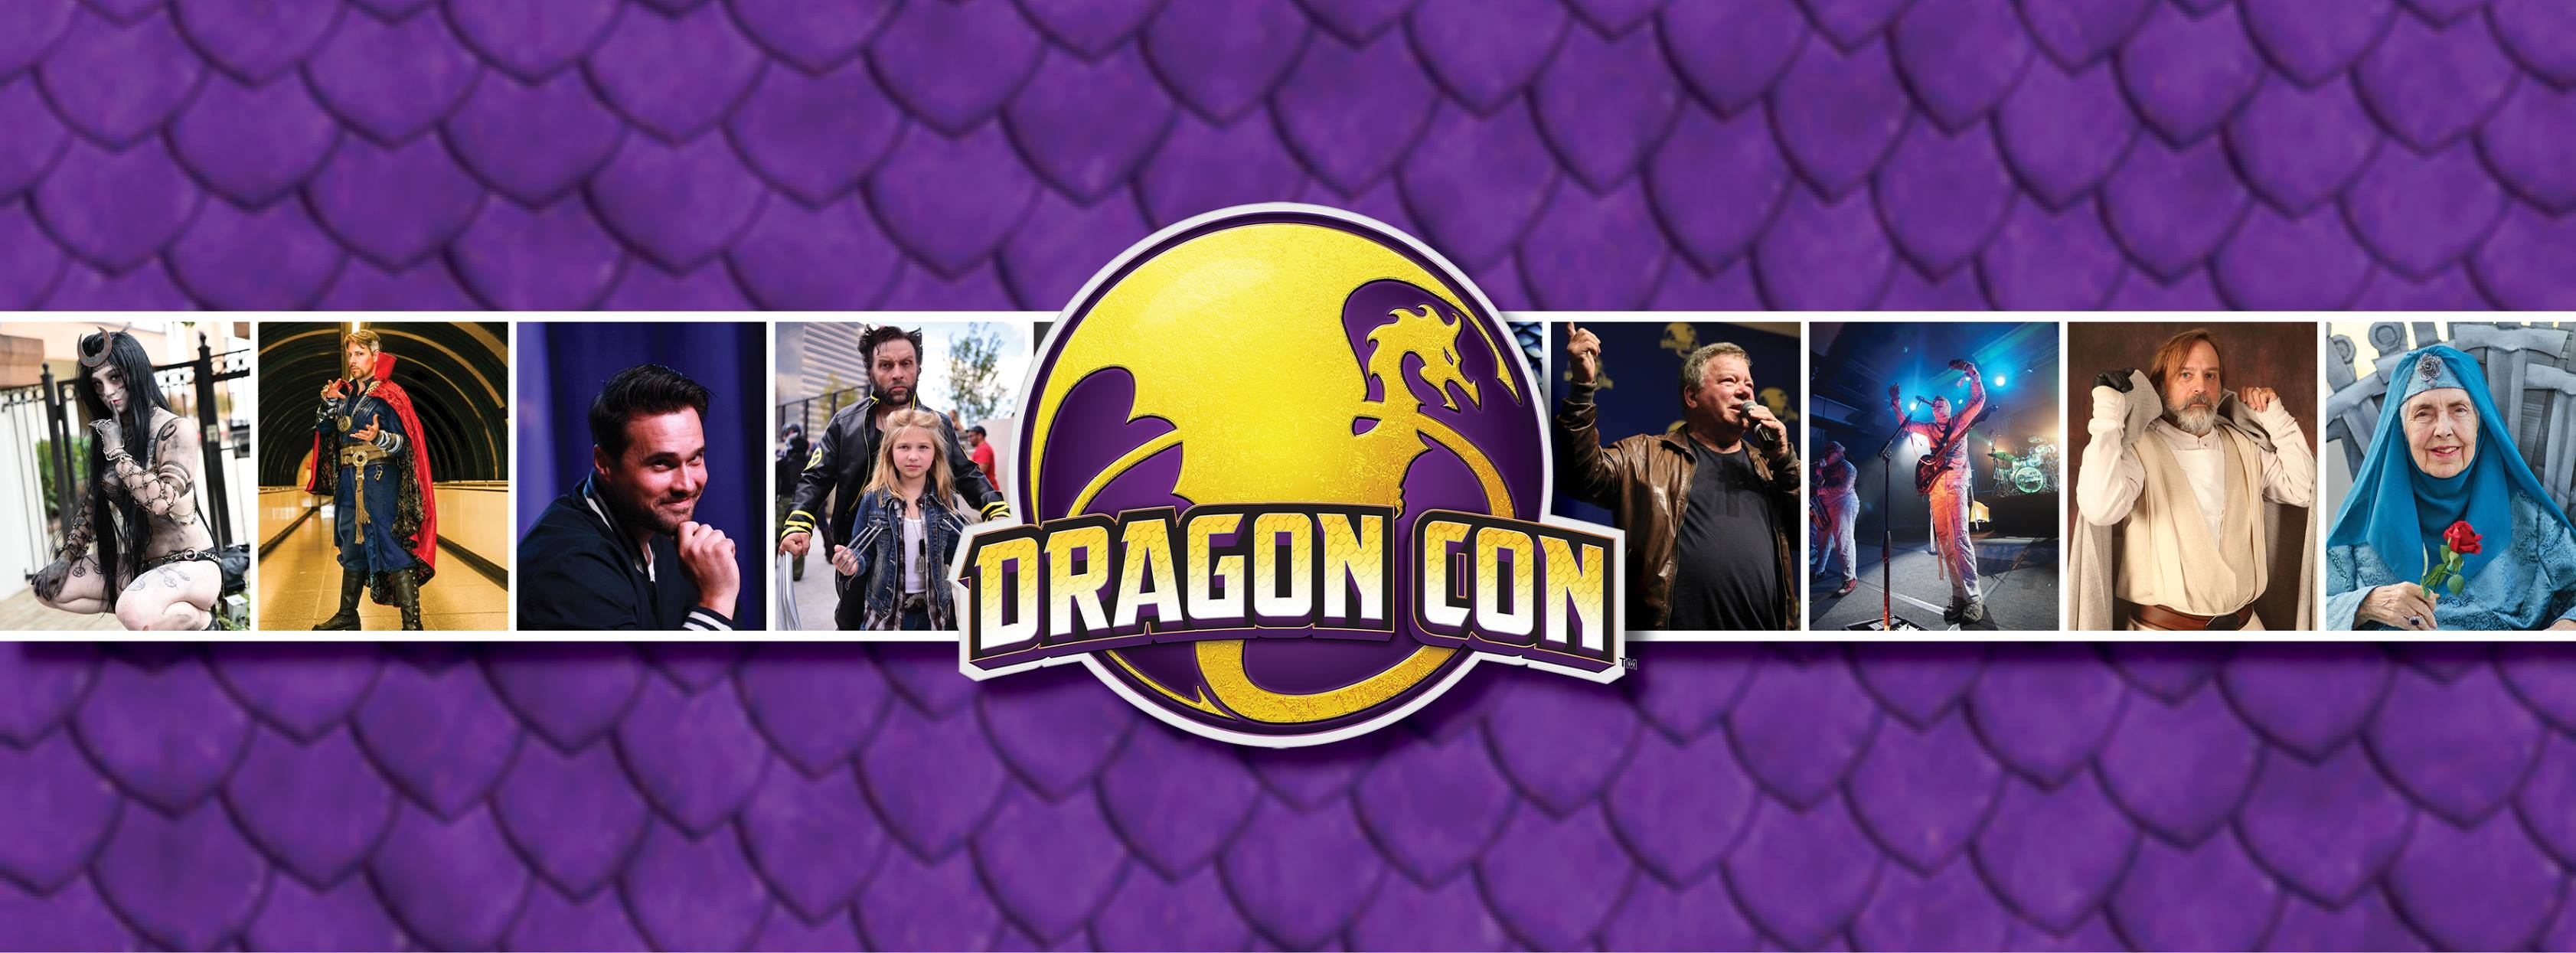 Dragon Con, Inc | LinkedIn